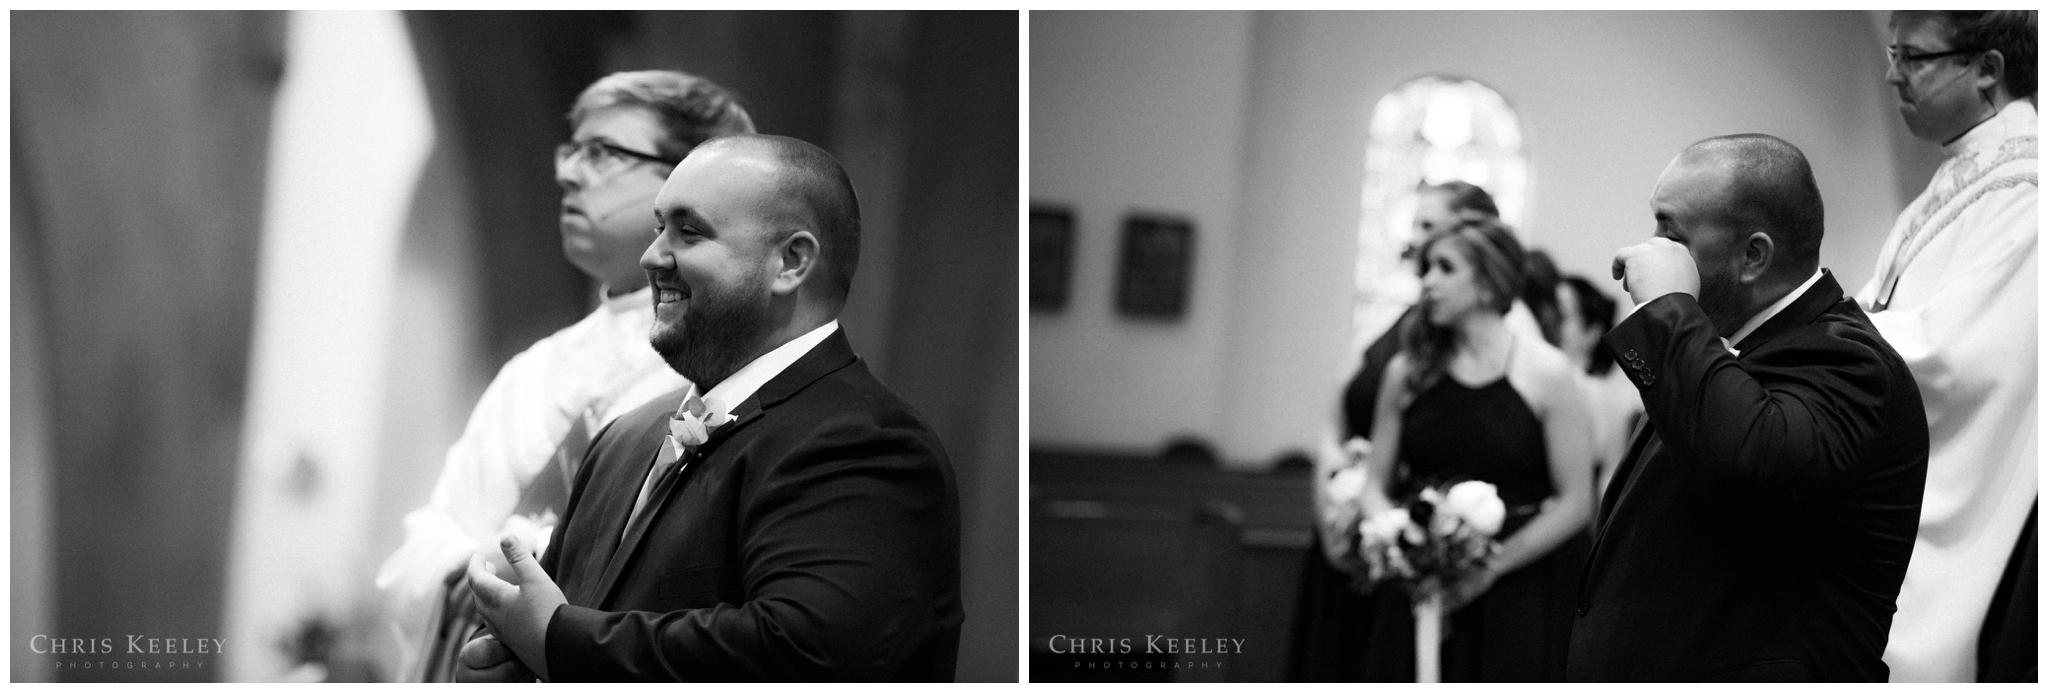 burrows-new-hampshire-wedding-photographer-chris-keeley-24.jpg